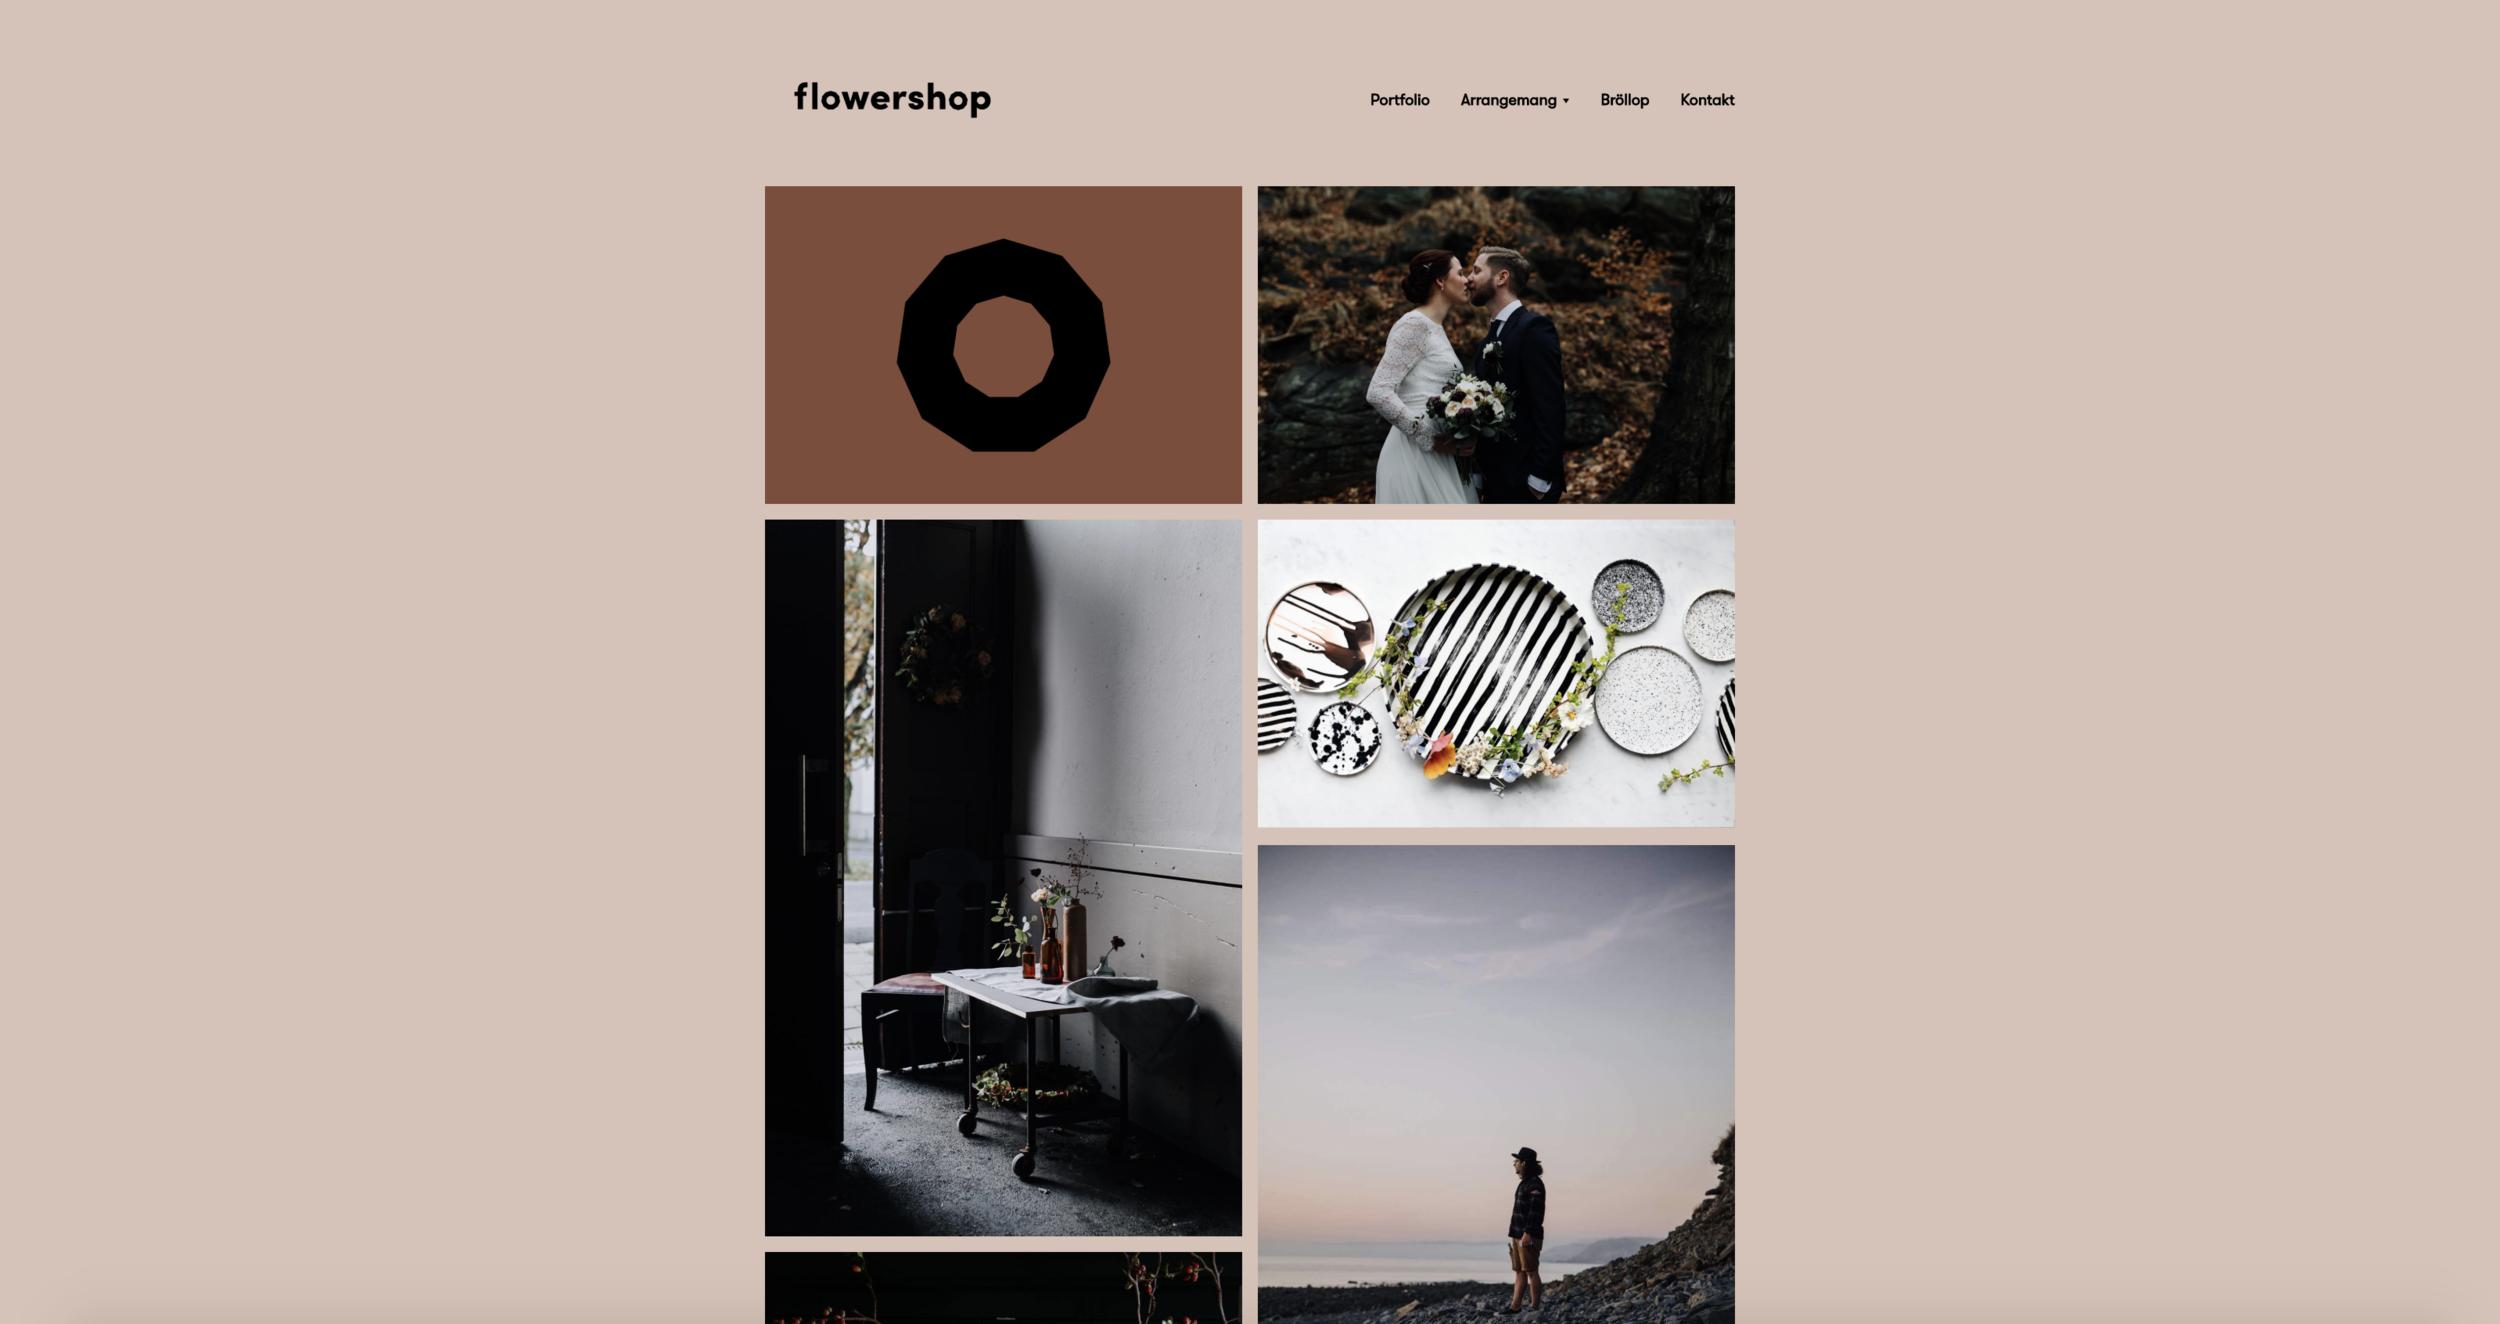 the flowershop+webbdesign